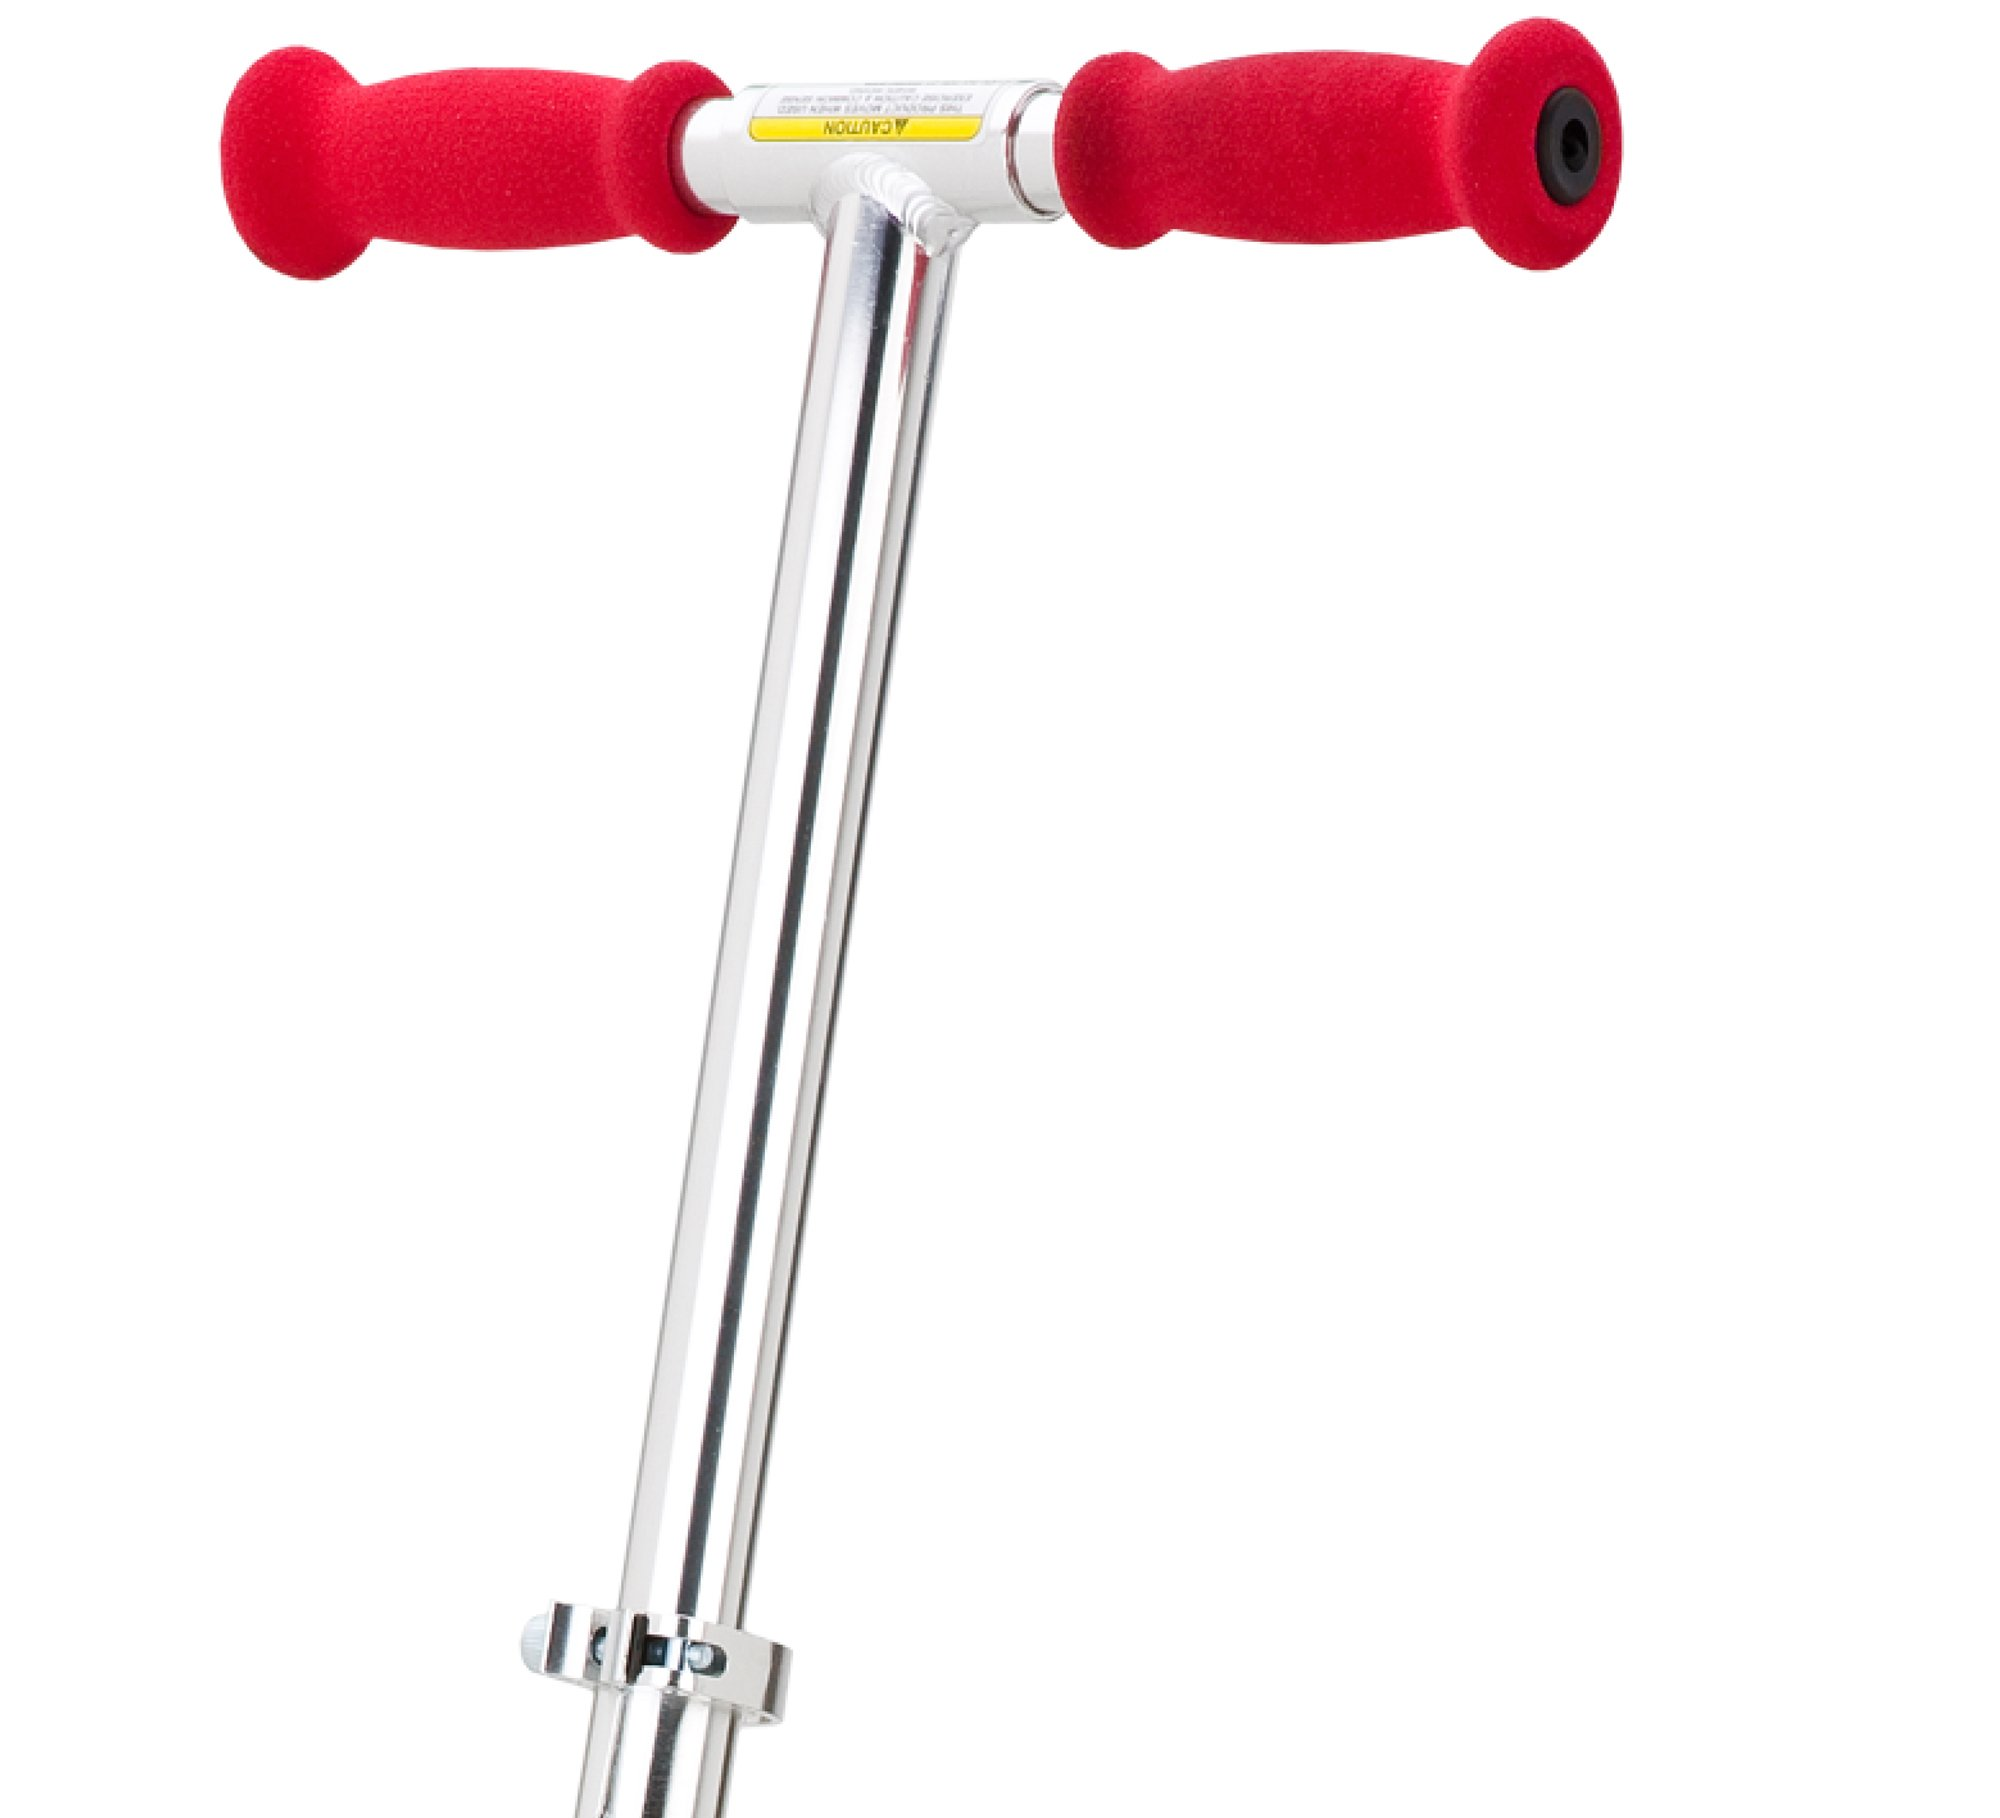 Razor A5 Lux Kick Scooter (Ffp), Red